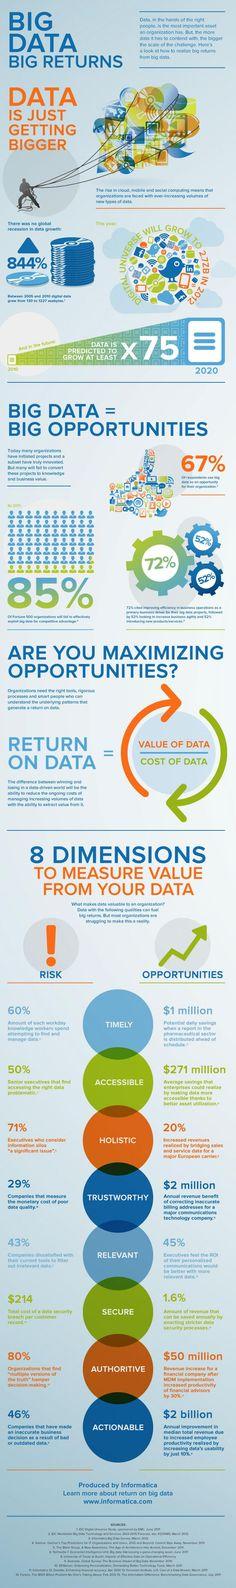 Big Data, Big Returns Infographic